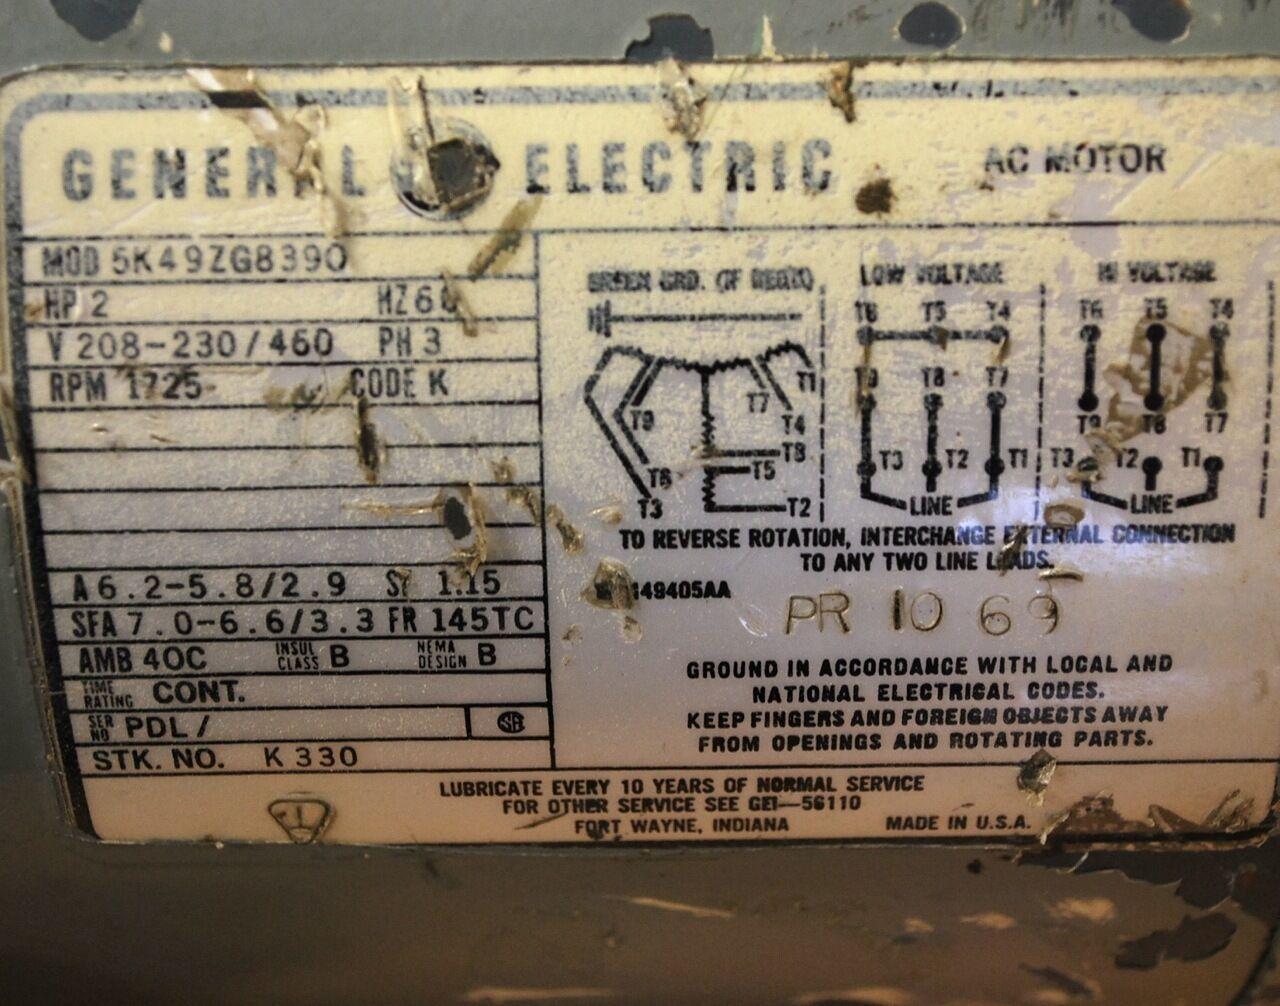 GE Motors K330 2 HP 1725 RPM 208-230/480v 60hz 3ph AC Electric Motor